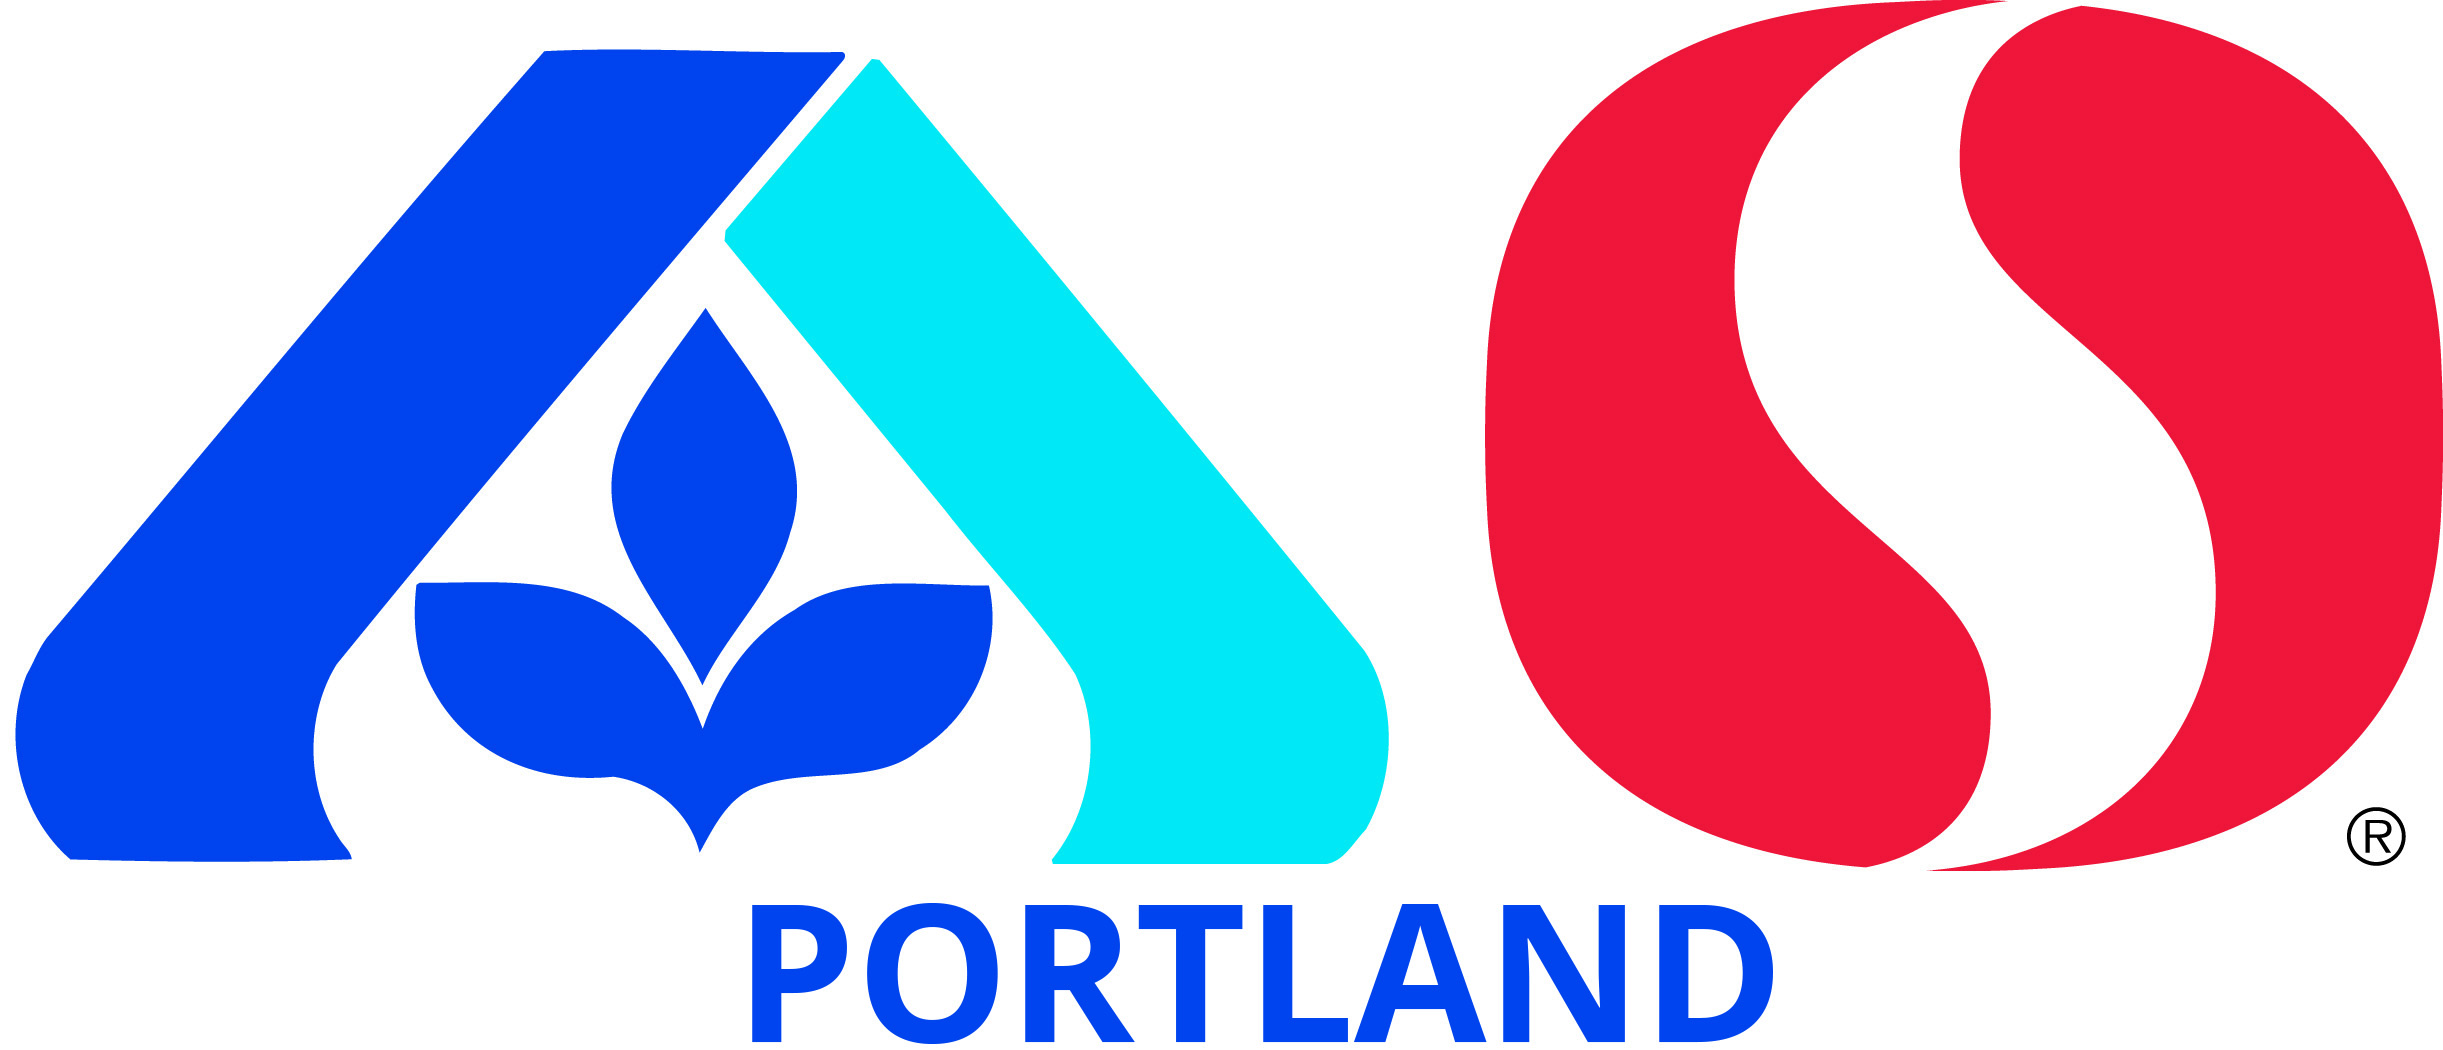 Albertsons Safeway Portland